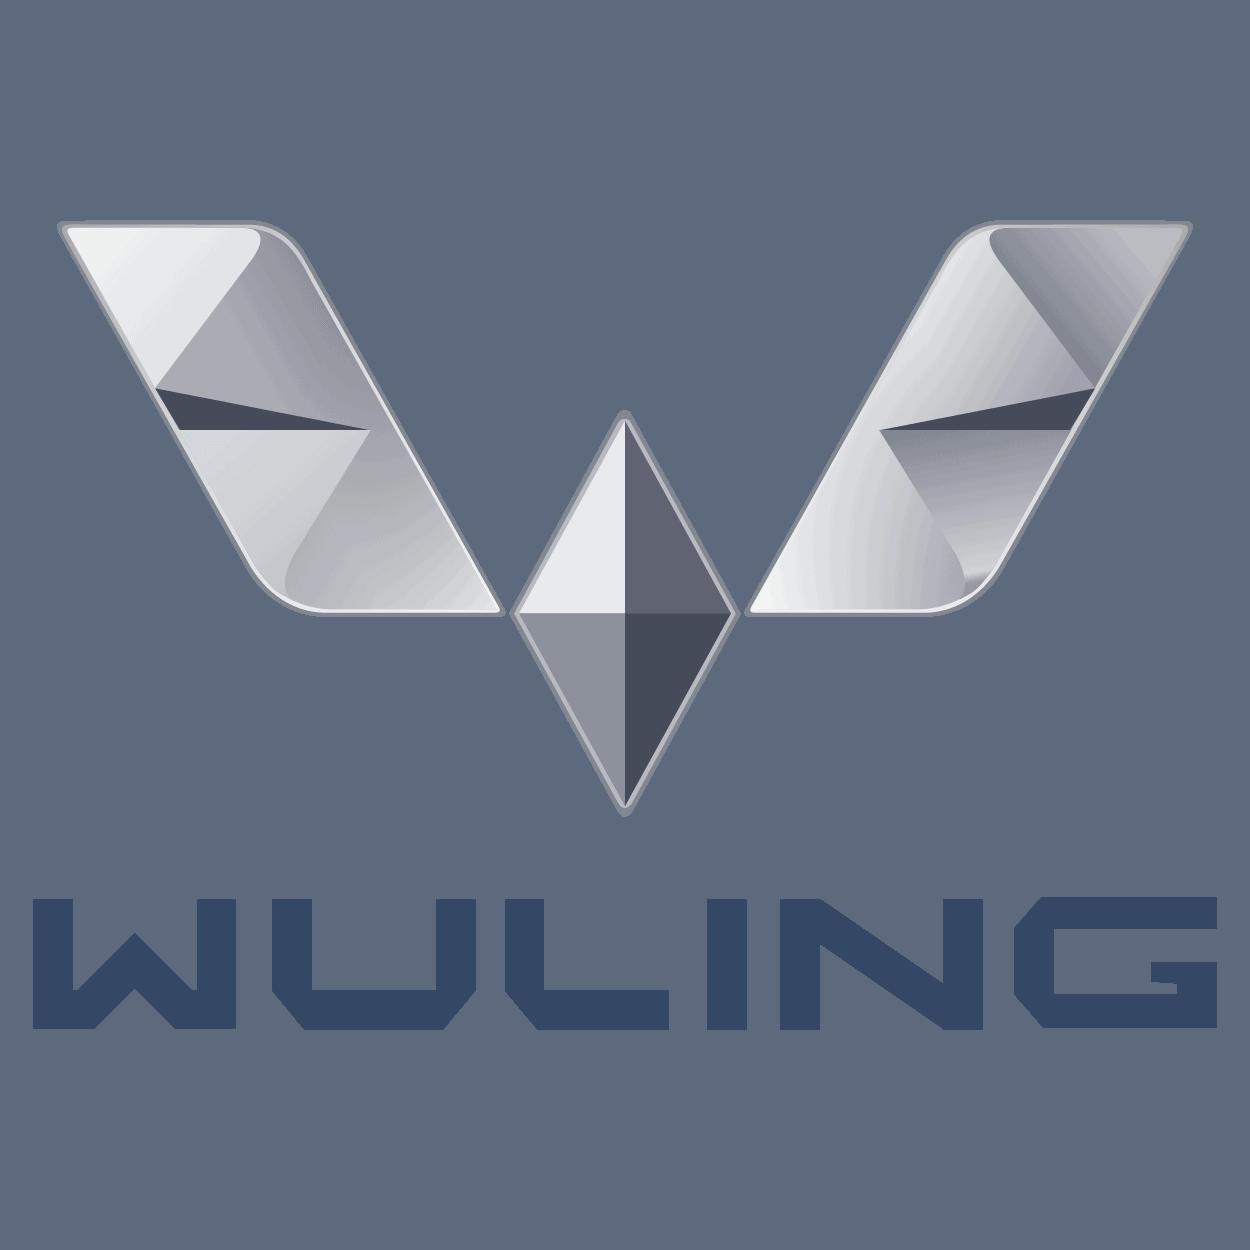 Wuling Logo png